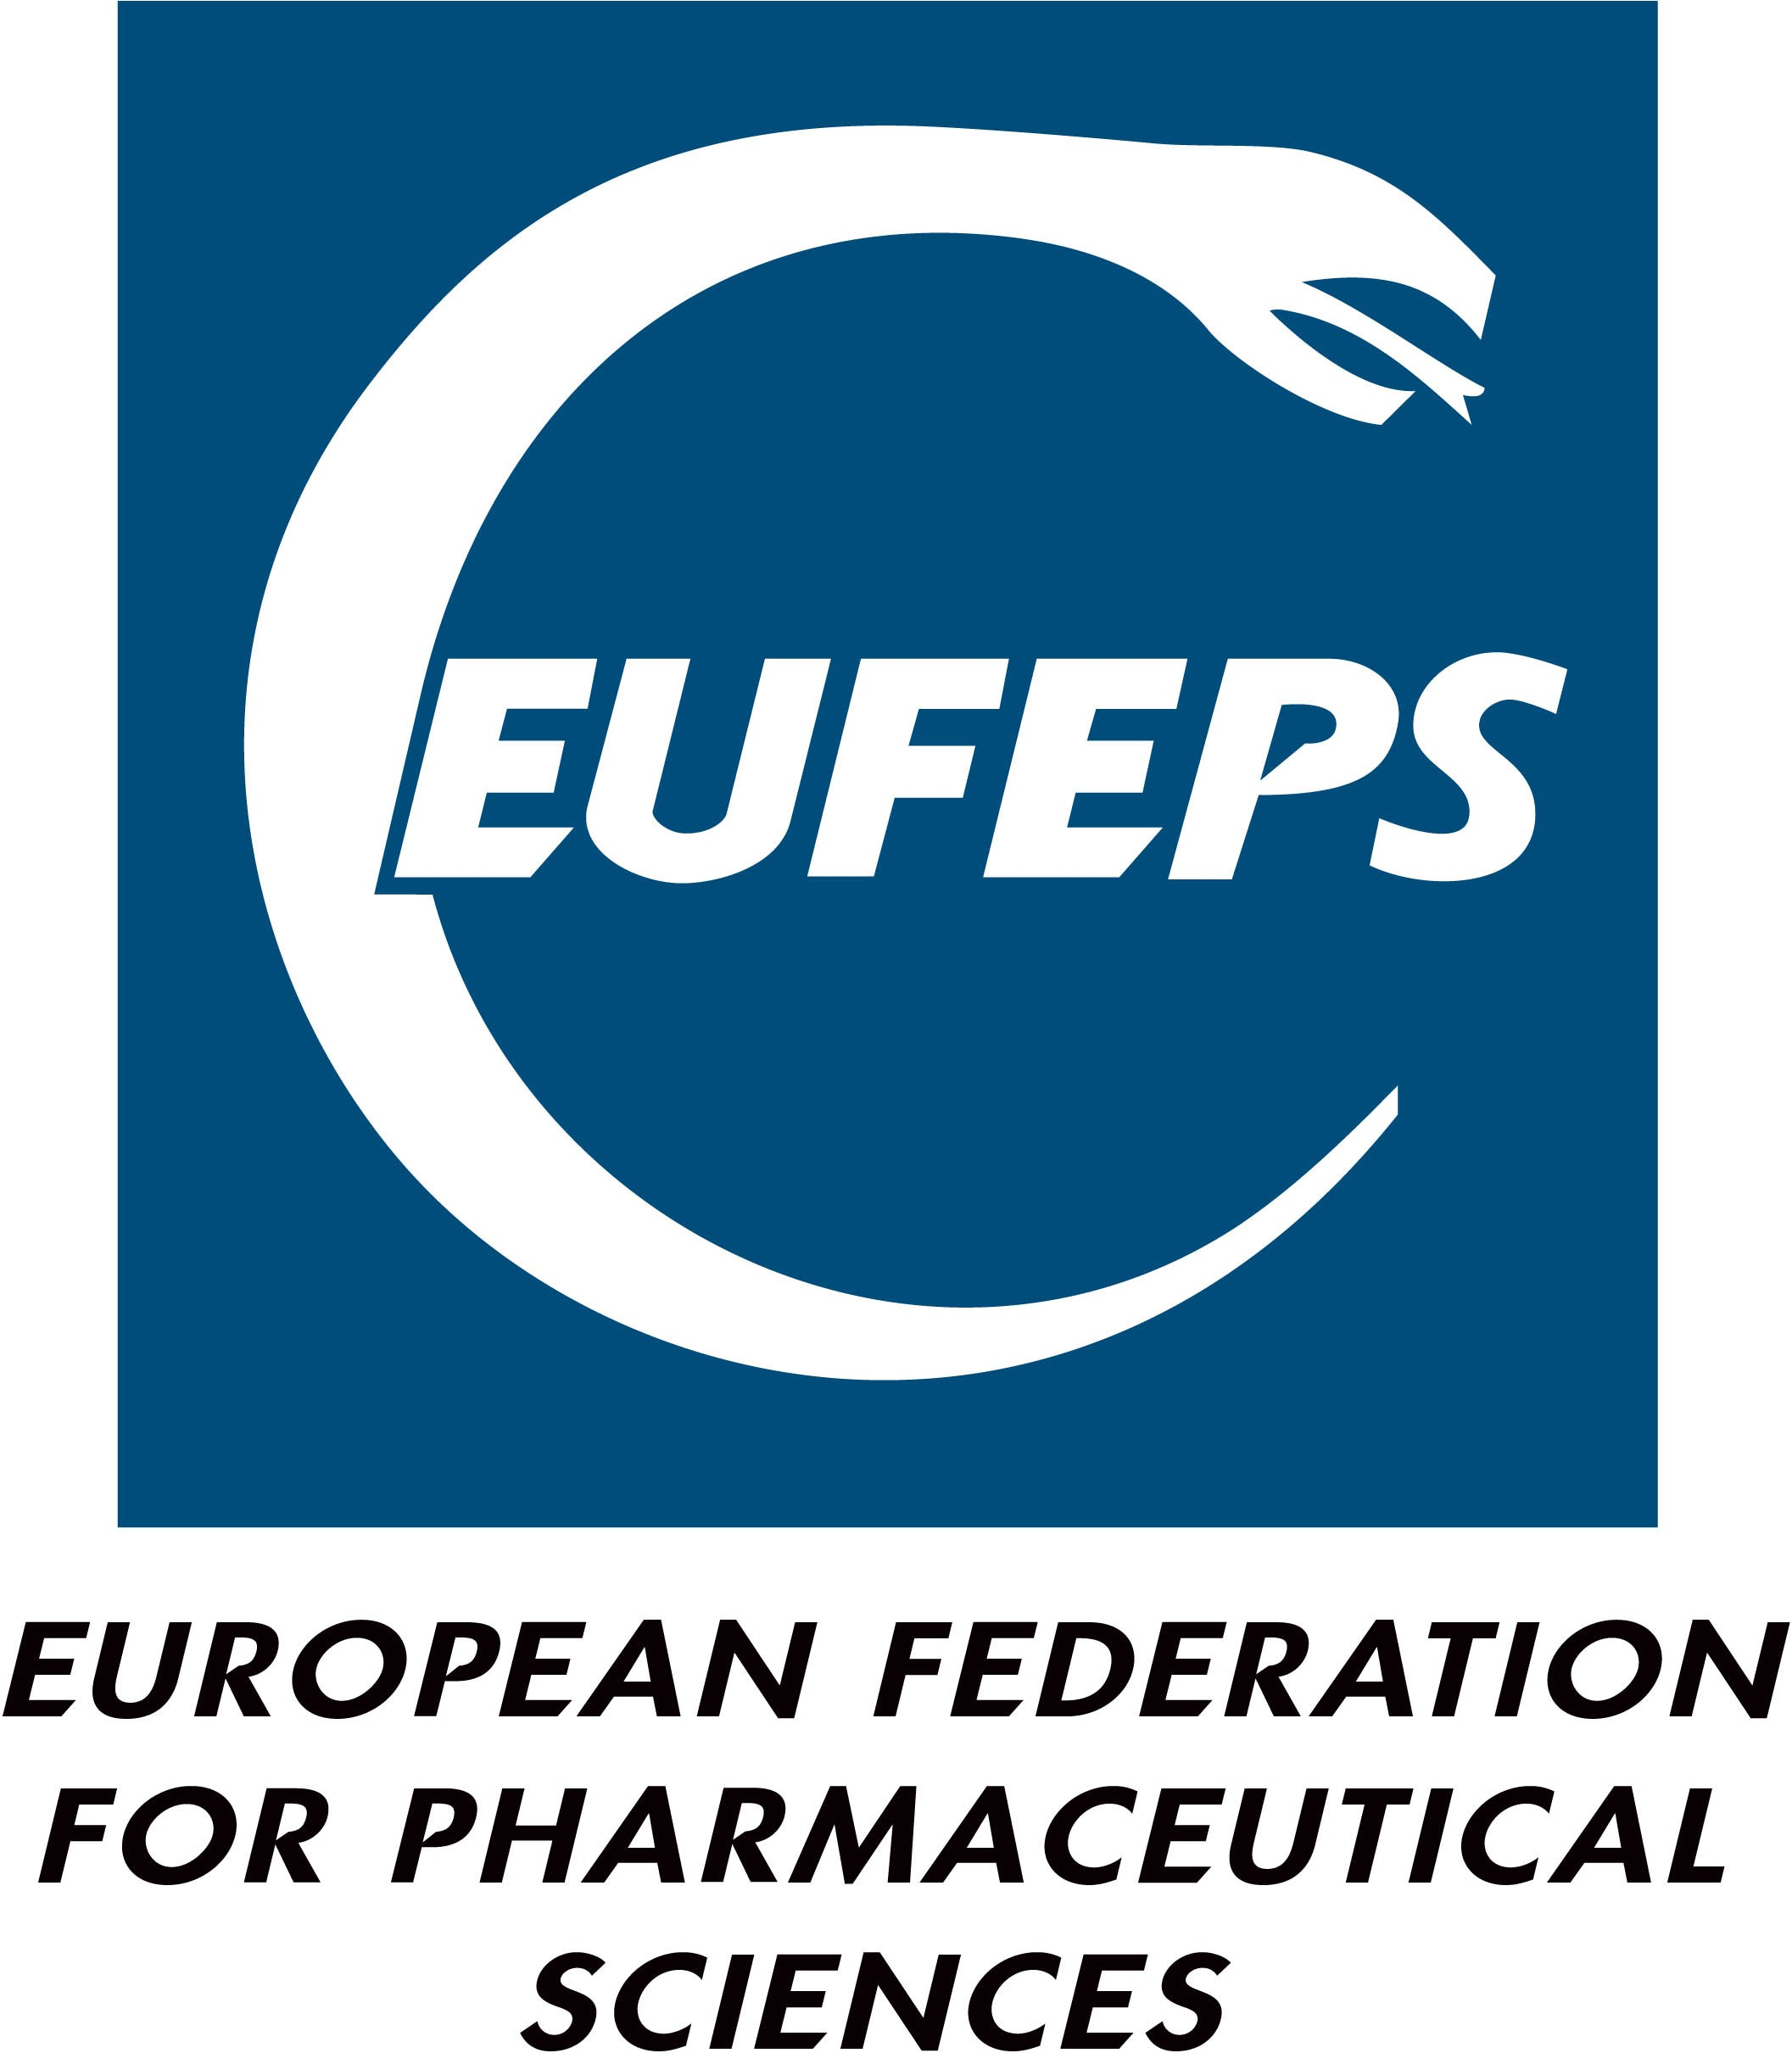 logo for European Federation for Pharmaceutical Sciences